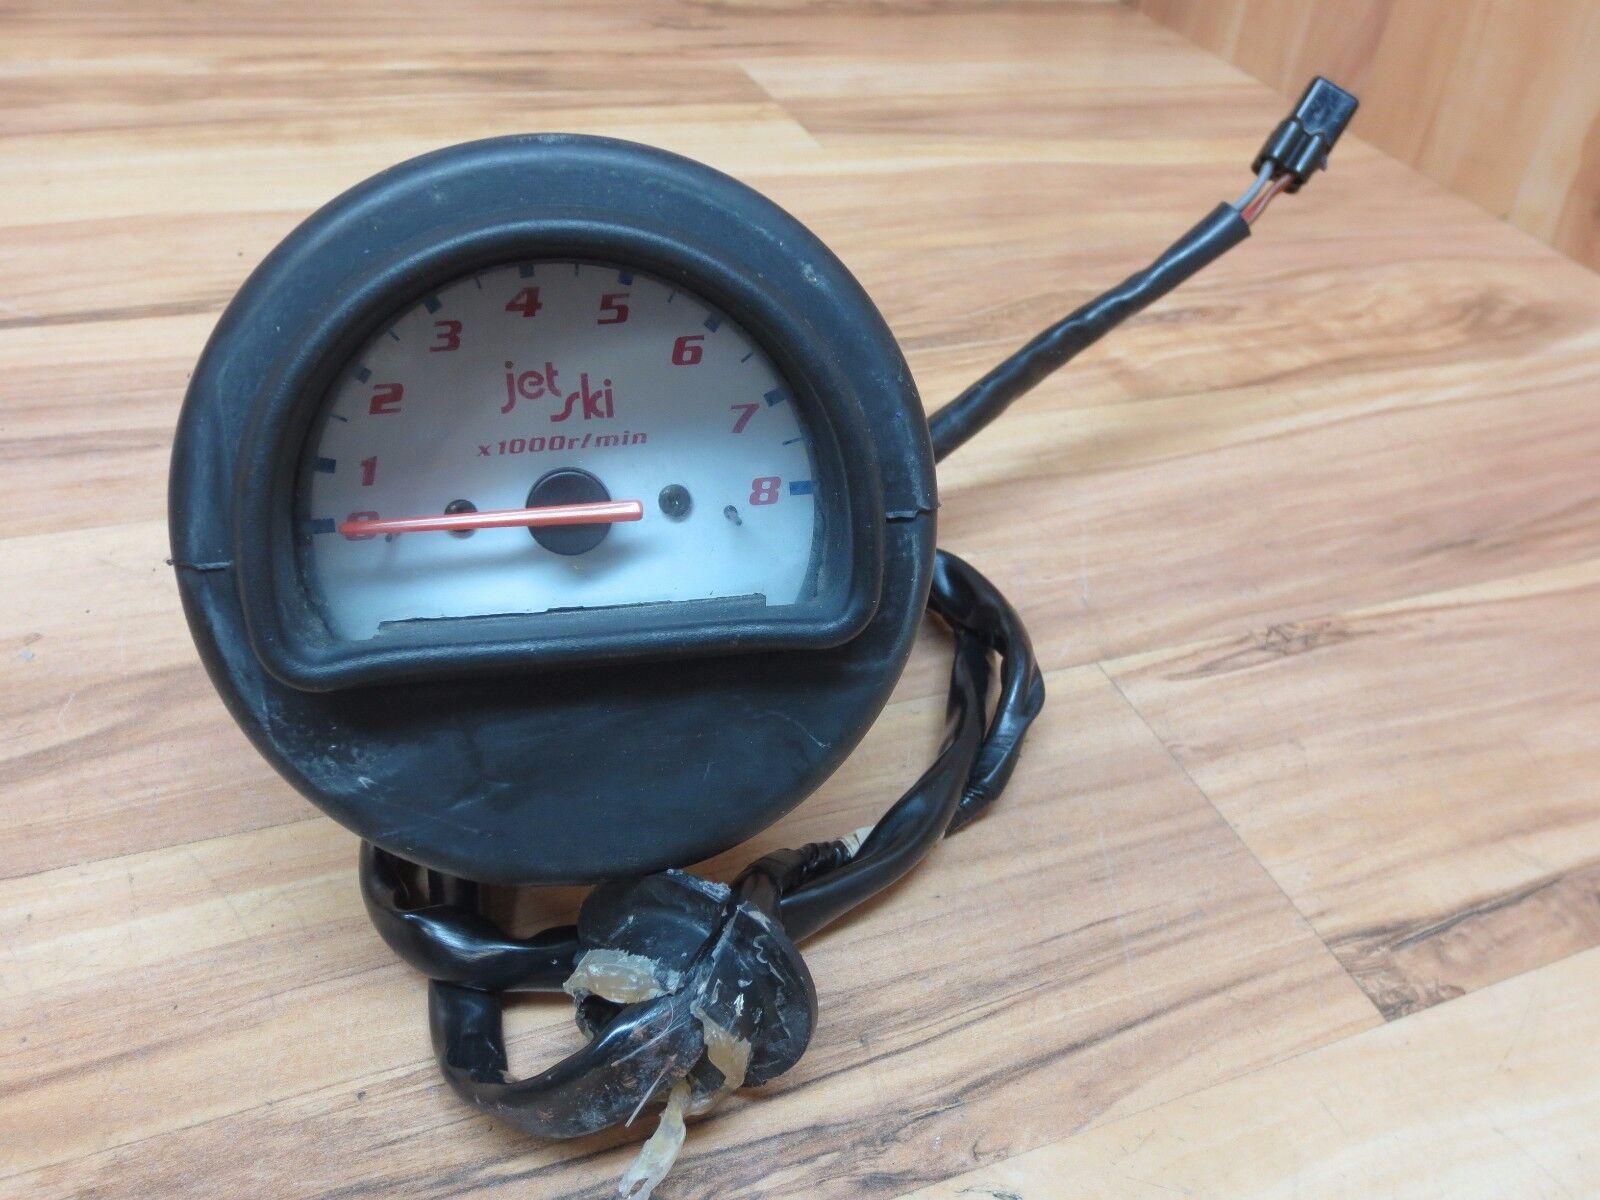 1995 96 97 Kawasaki Zxi 750 Tach Messgerät Tachometer Rpm